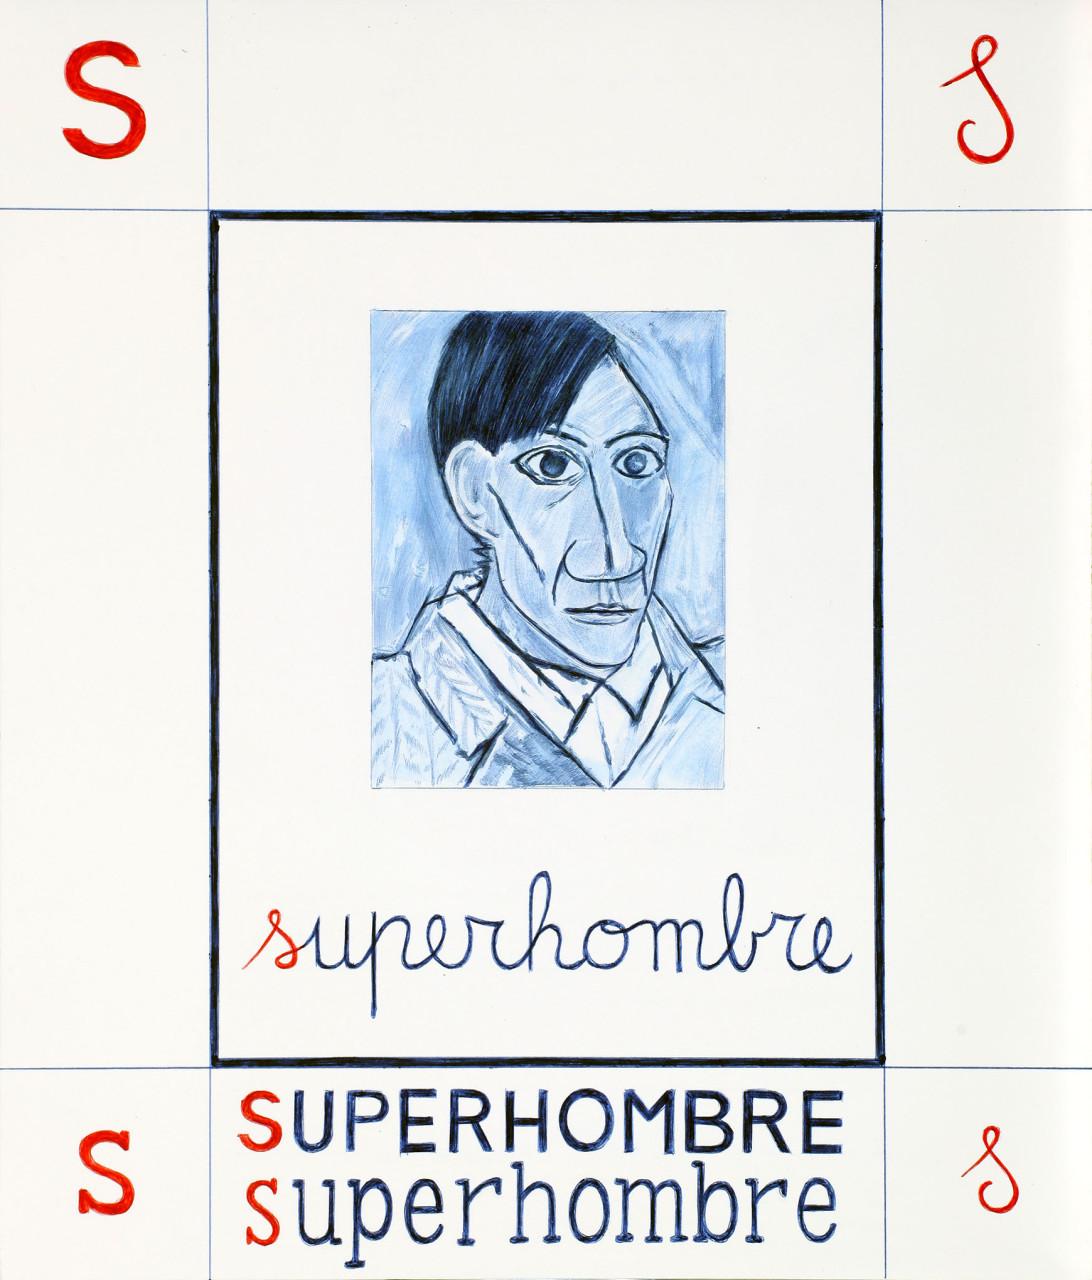 09S-superhombre_bassa